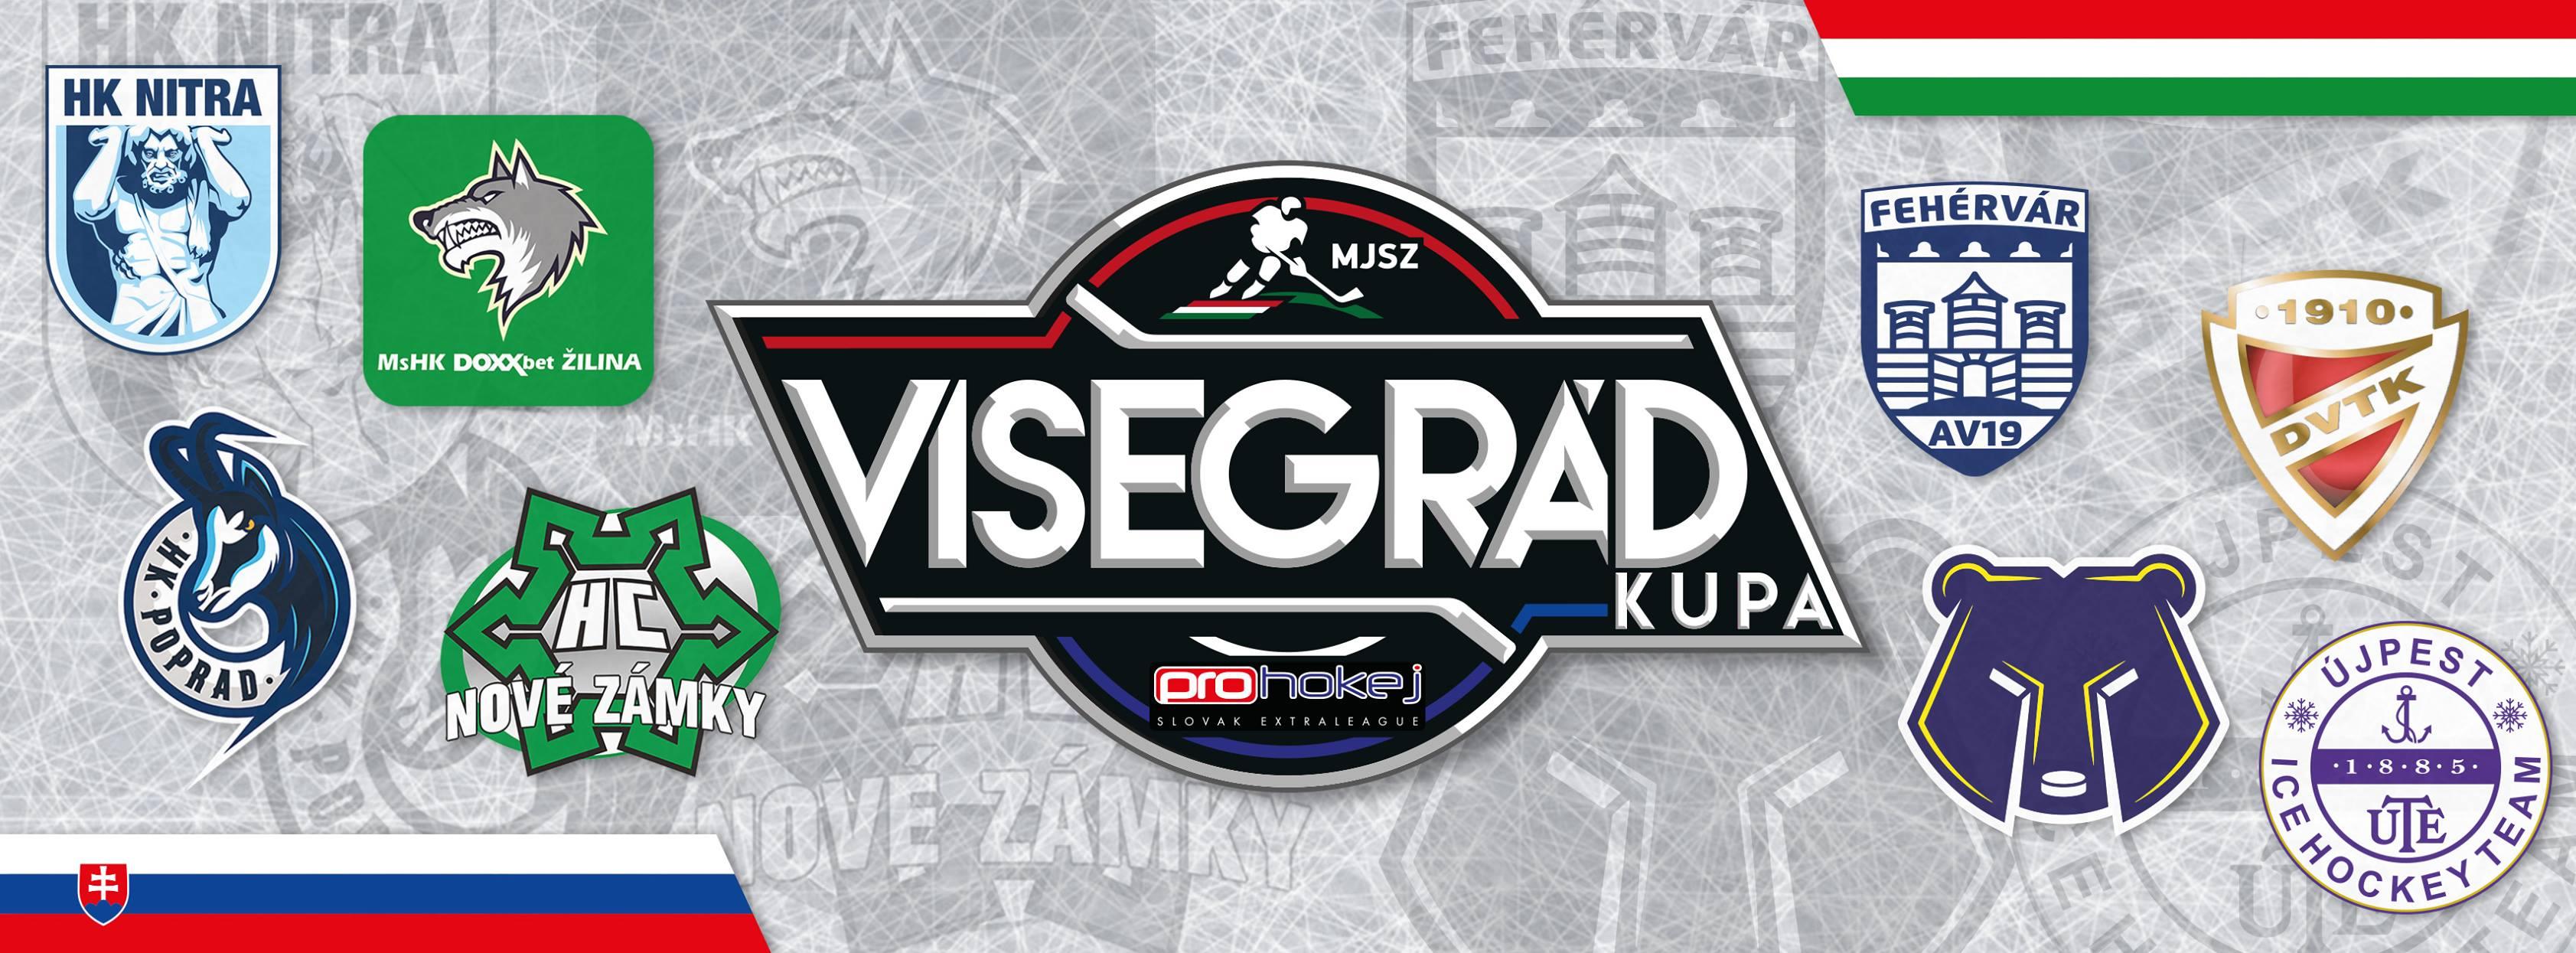 Visegrad Kupa csapatok